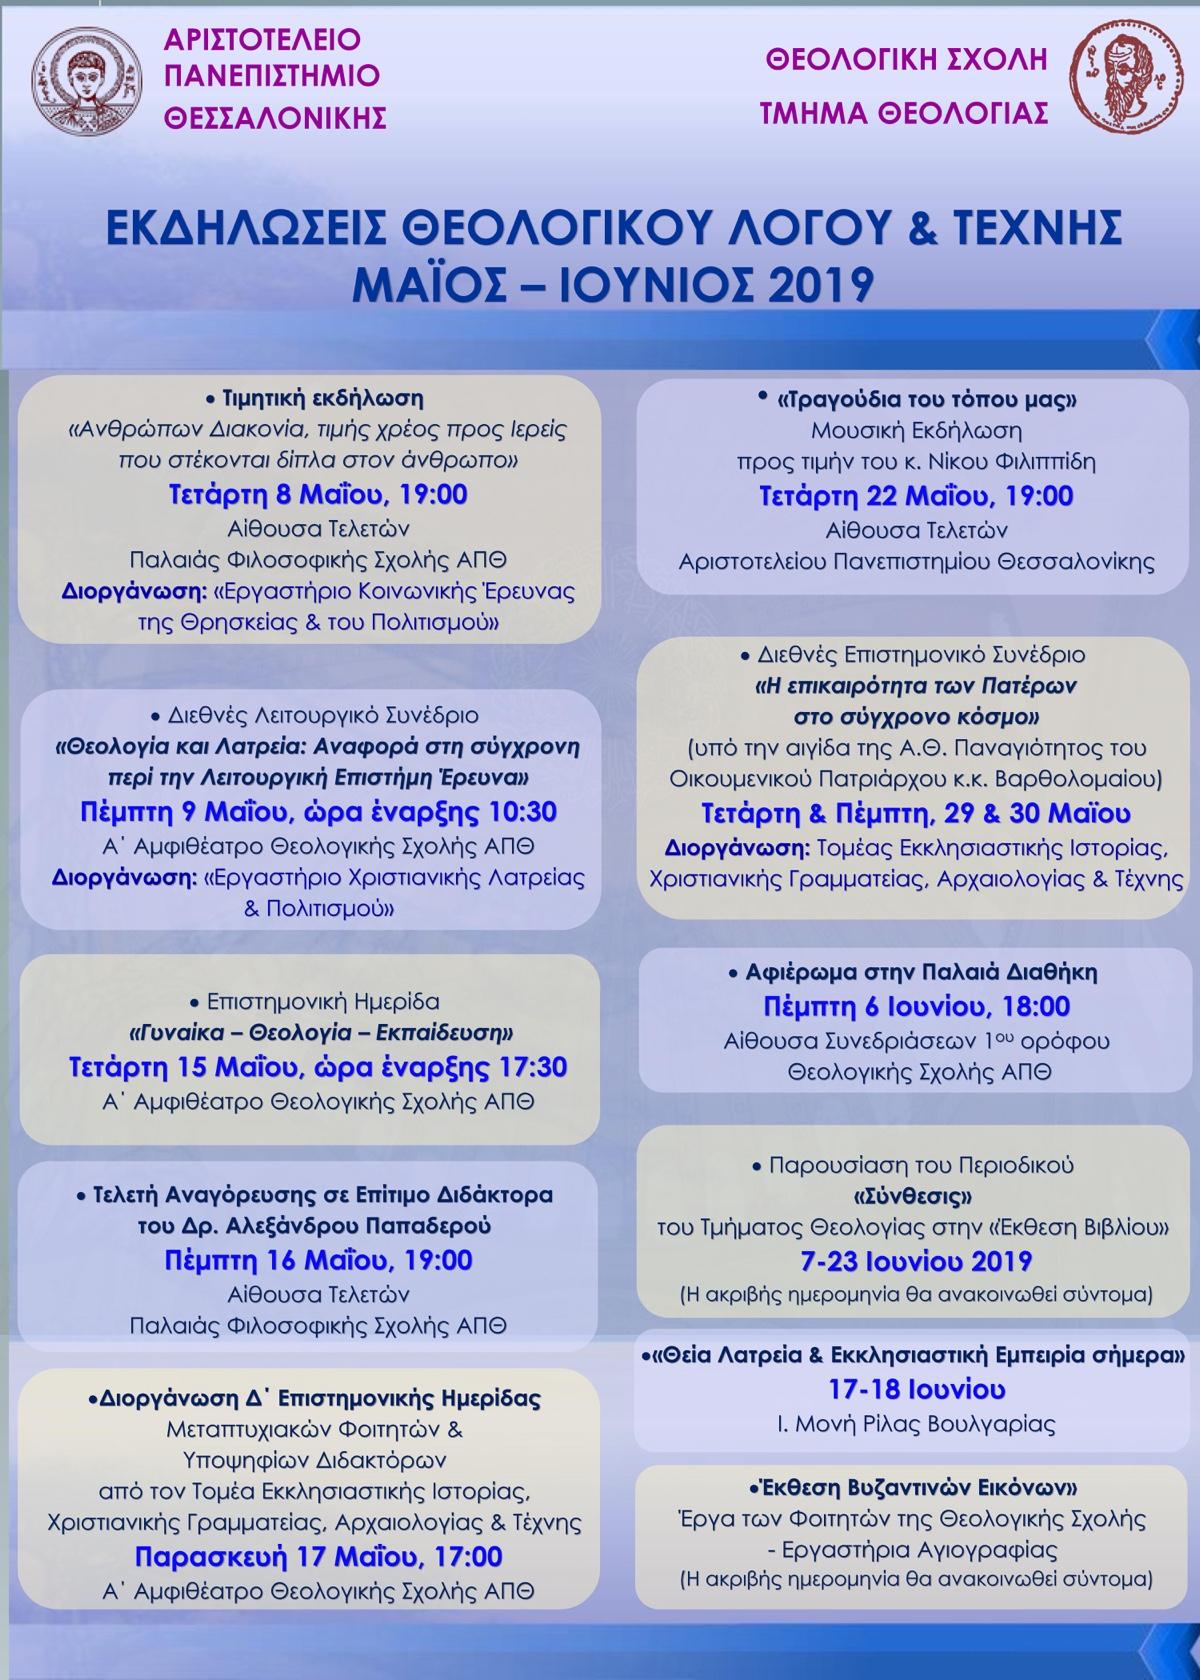 ORTHODOXIA INFO | Εκδηλώσεις θεολογικού λόγου και τέχνης Τμ. Θεολογίας 2019